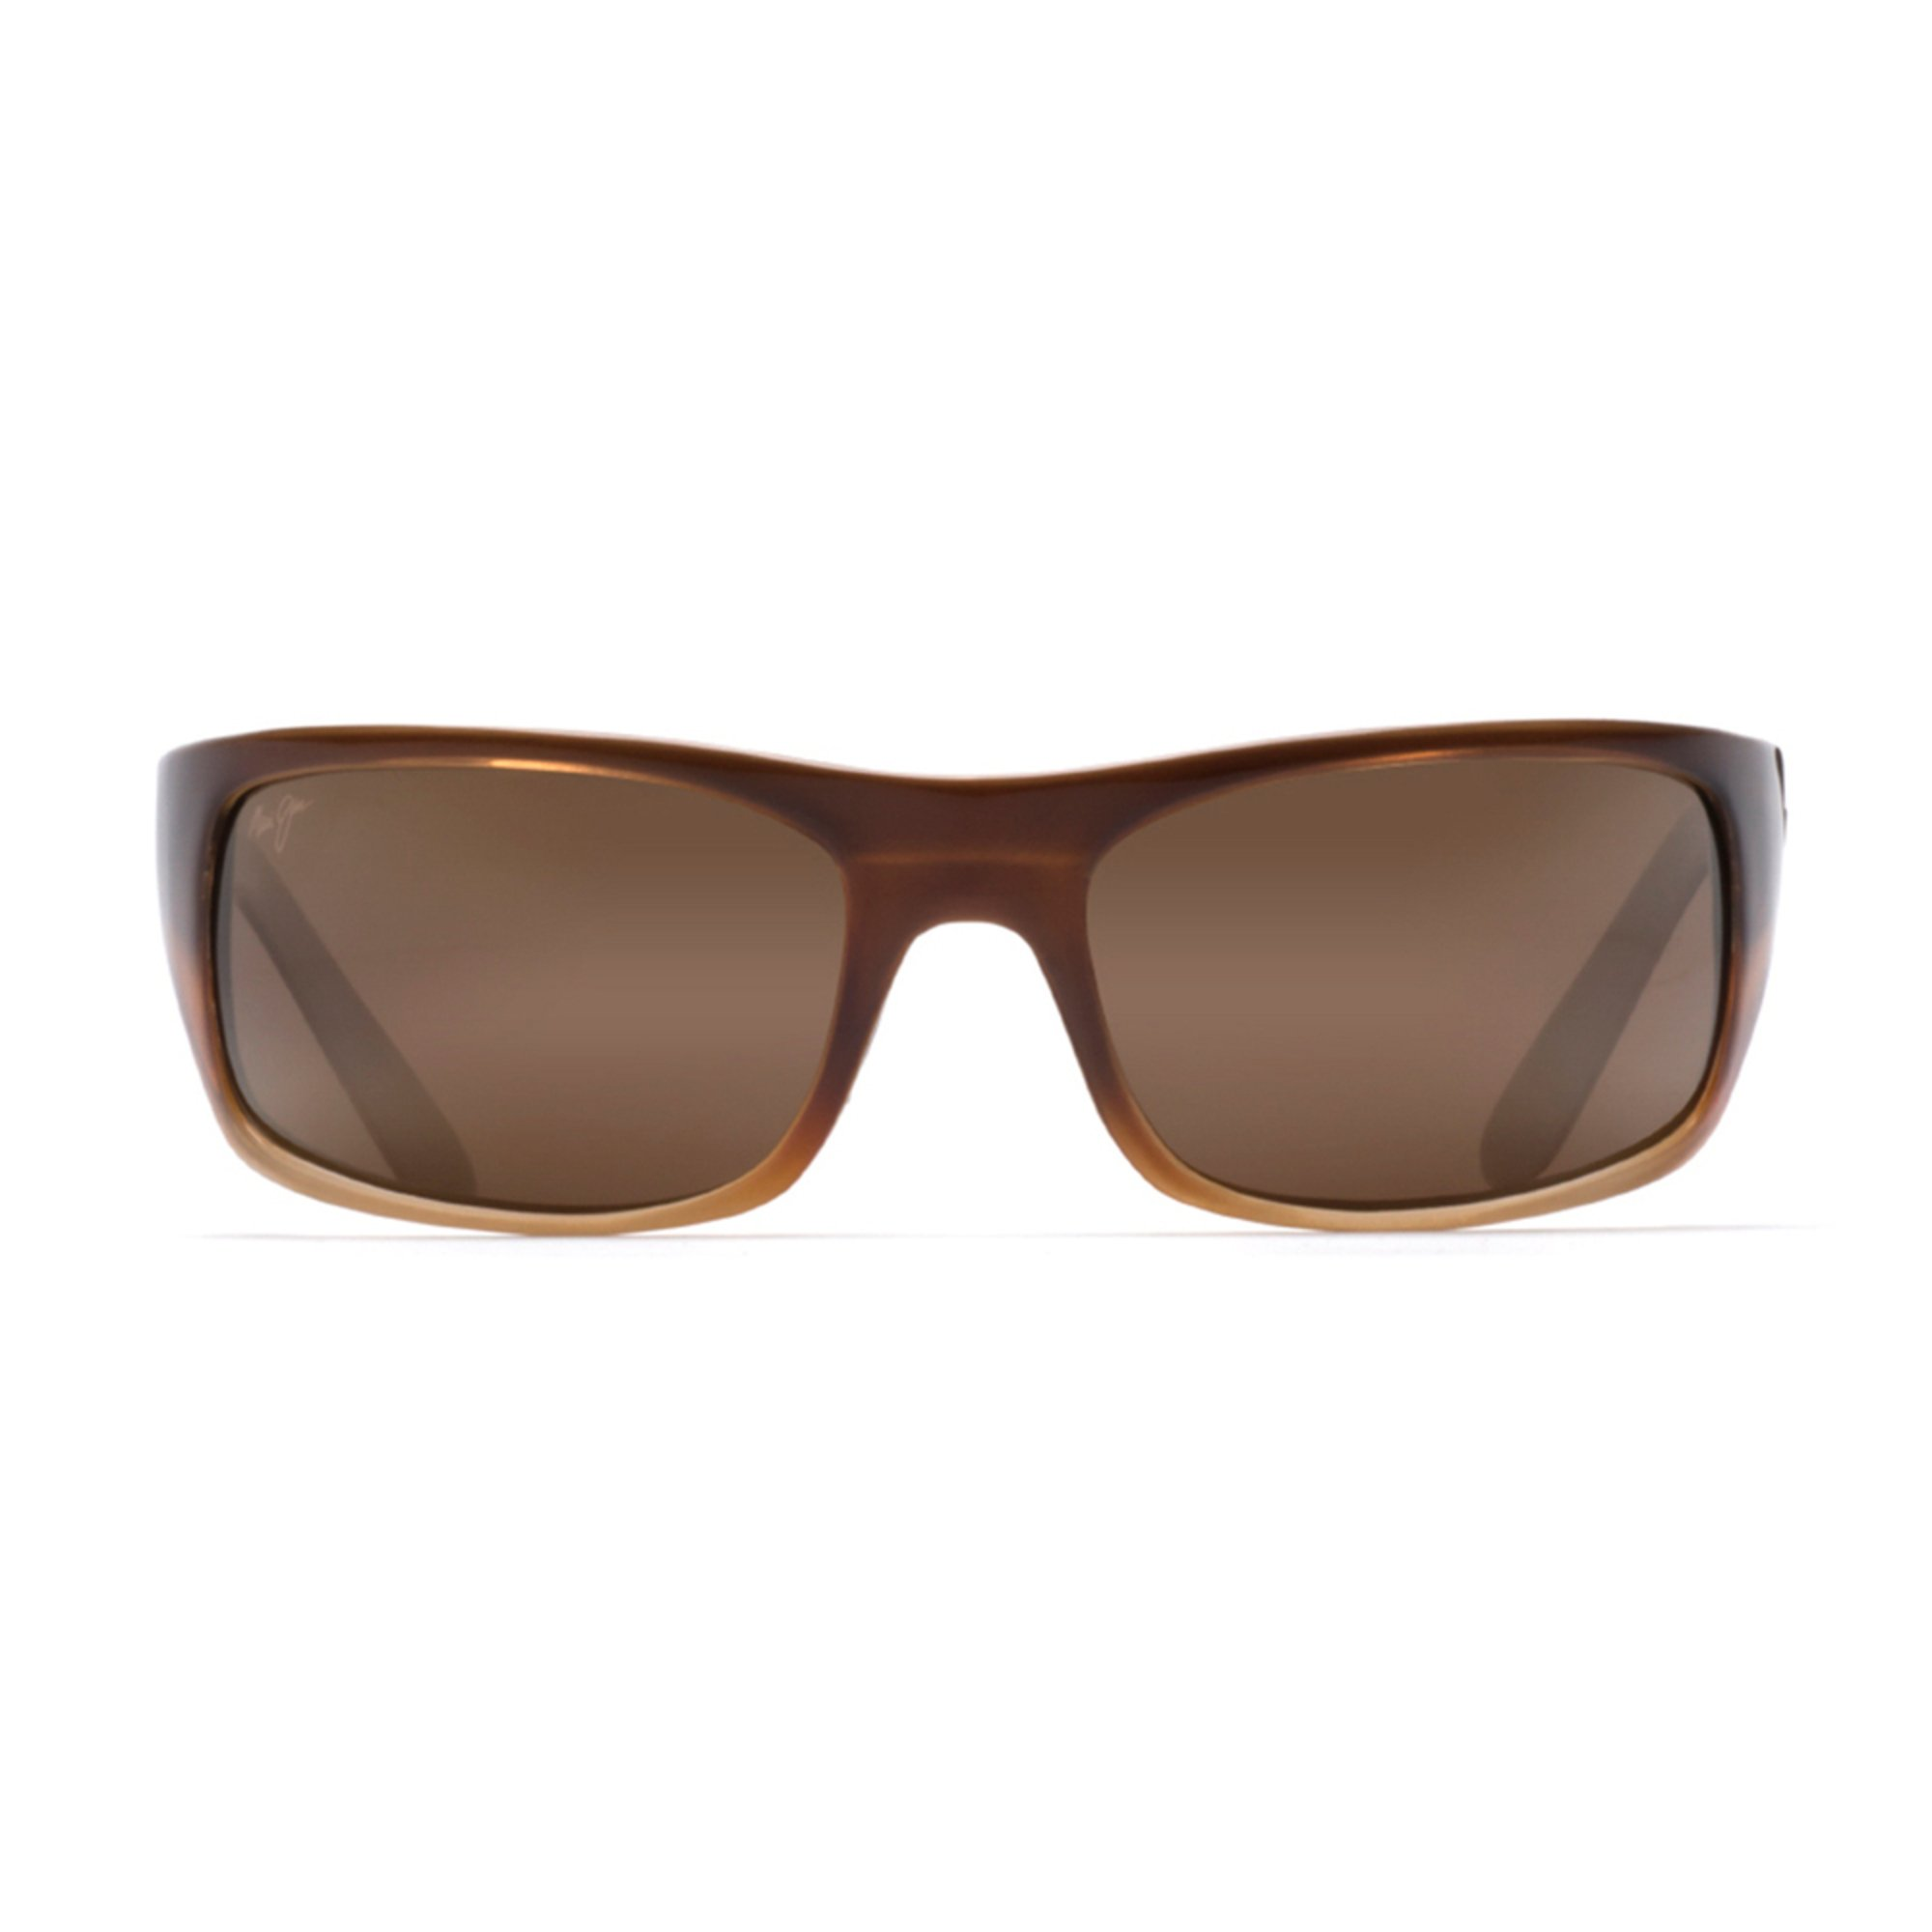 8b3a3e67461f Maui Jim Unisex Peahi Redfish Polarized Wrap Sunglasses | Unisex ...